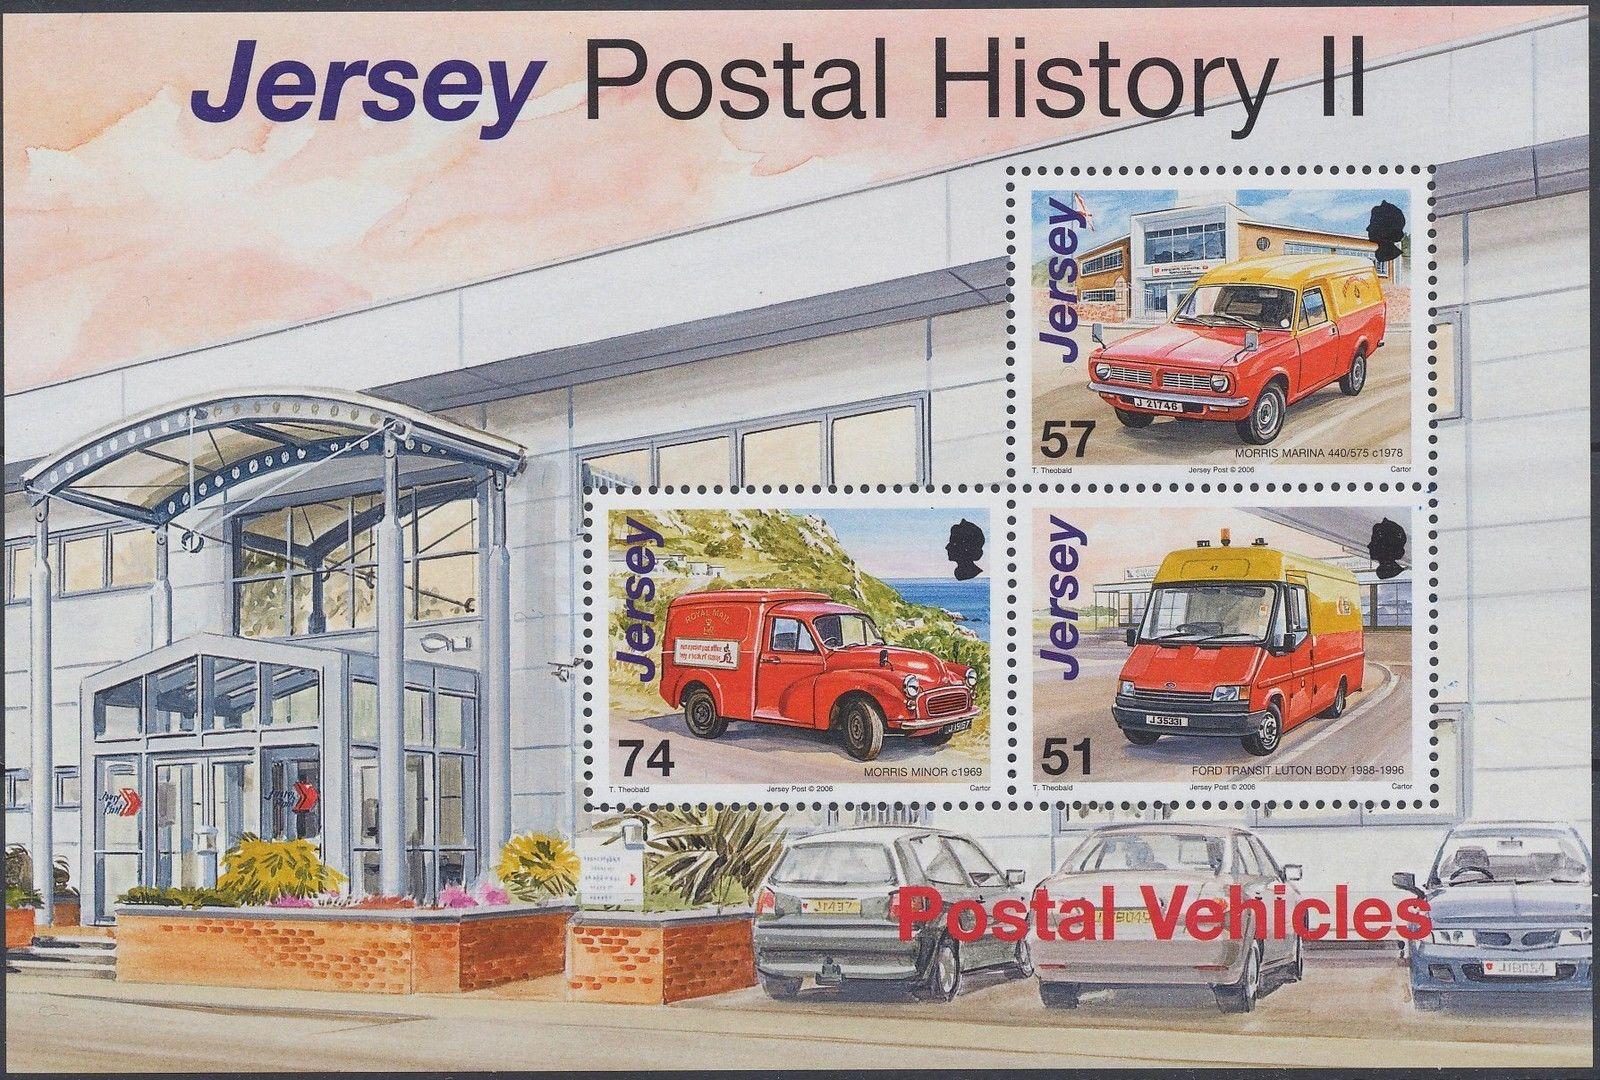 Jersey 2006 Postal History II - Postal Vehicles